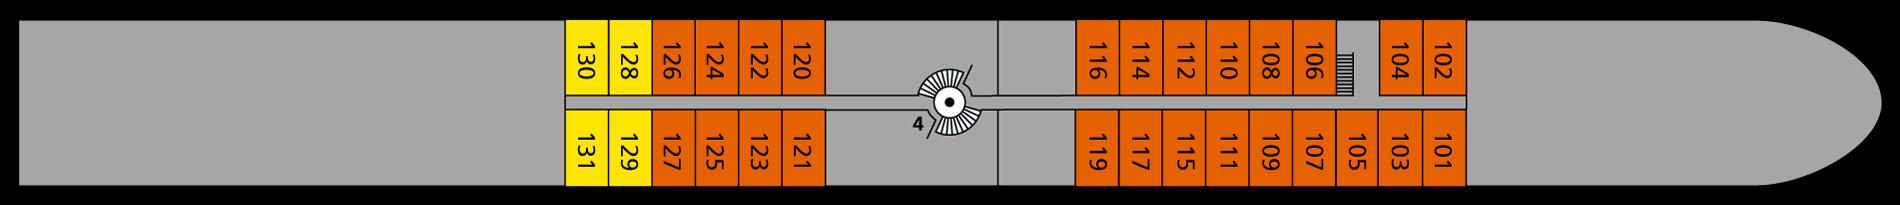 A-ROSA BRAVA Deck 1